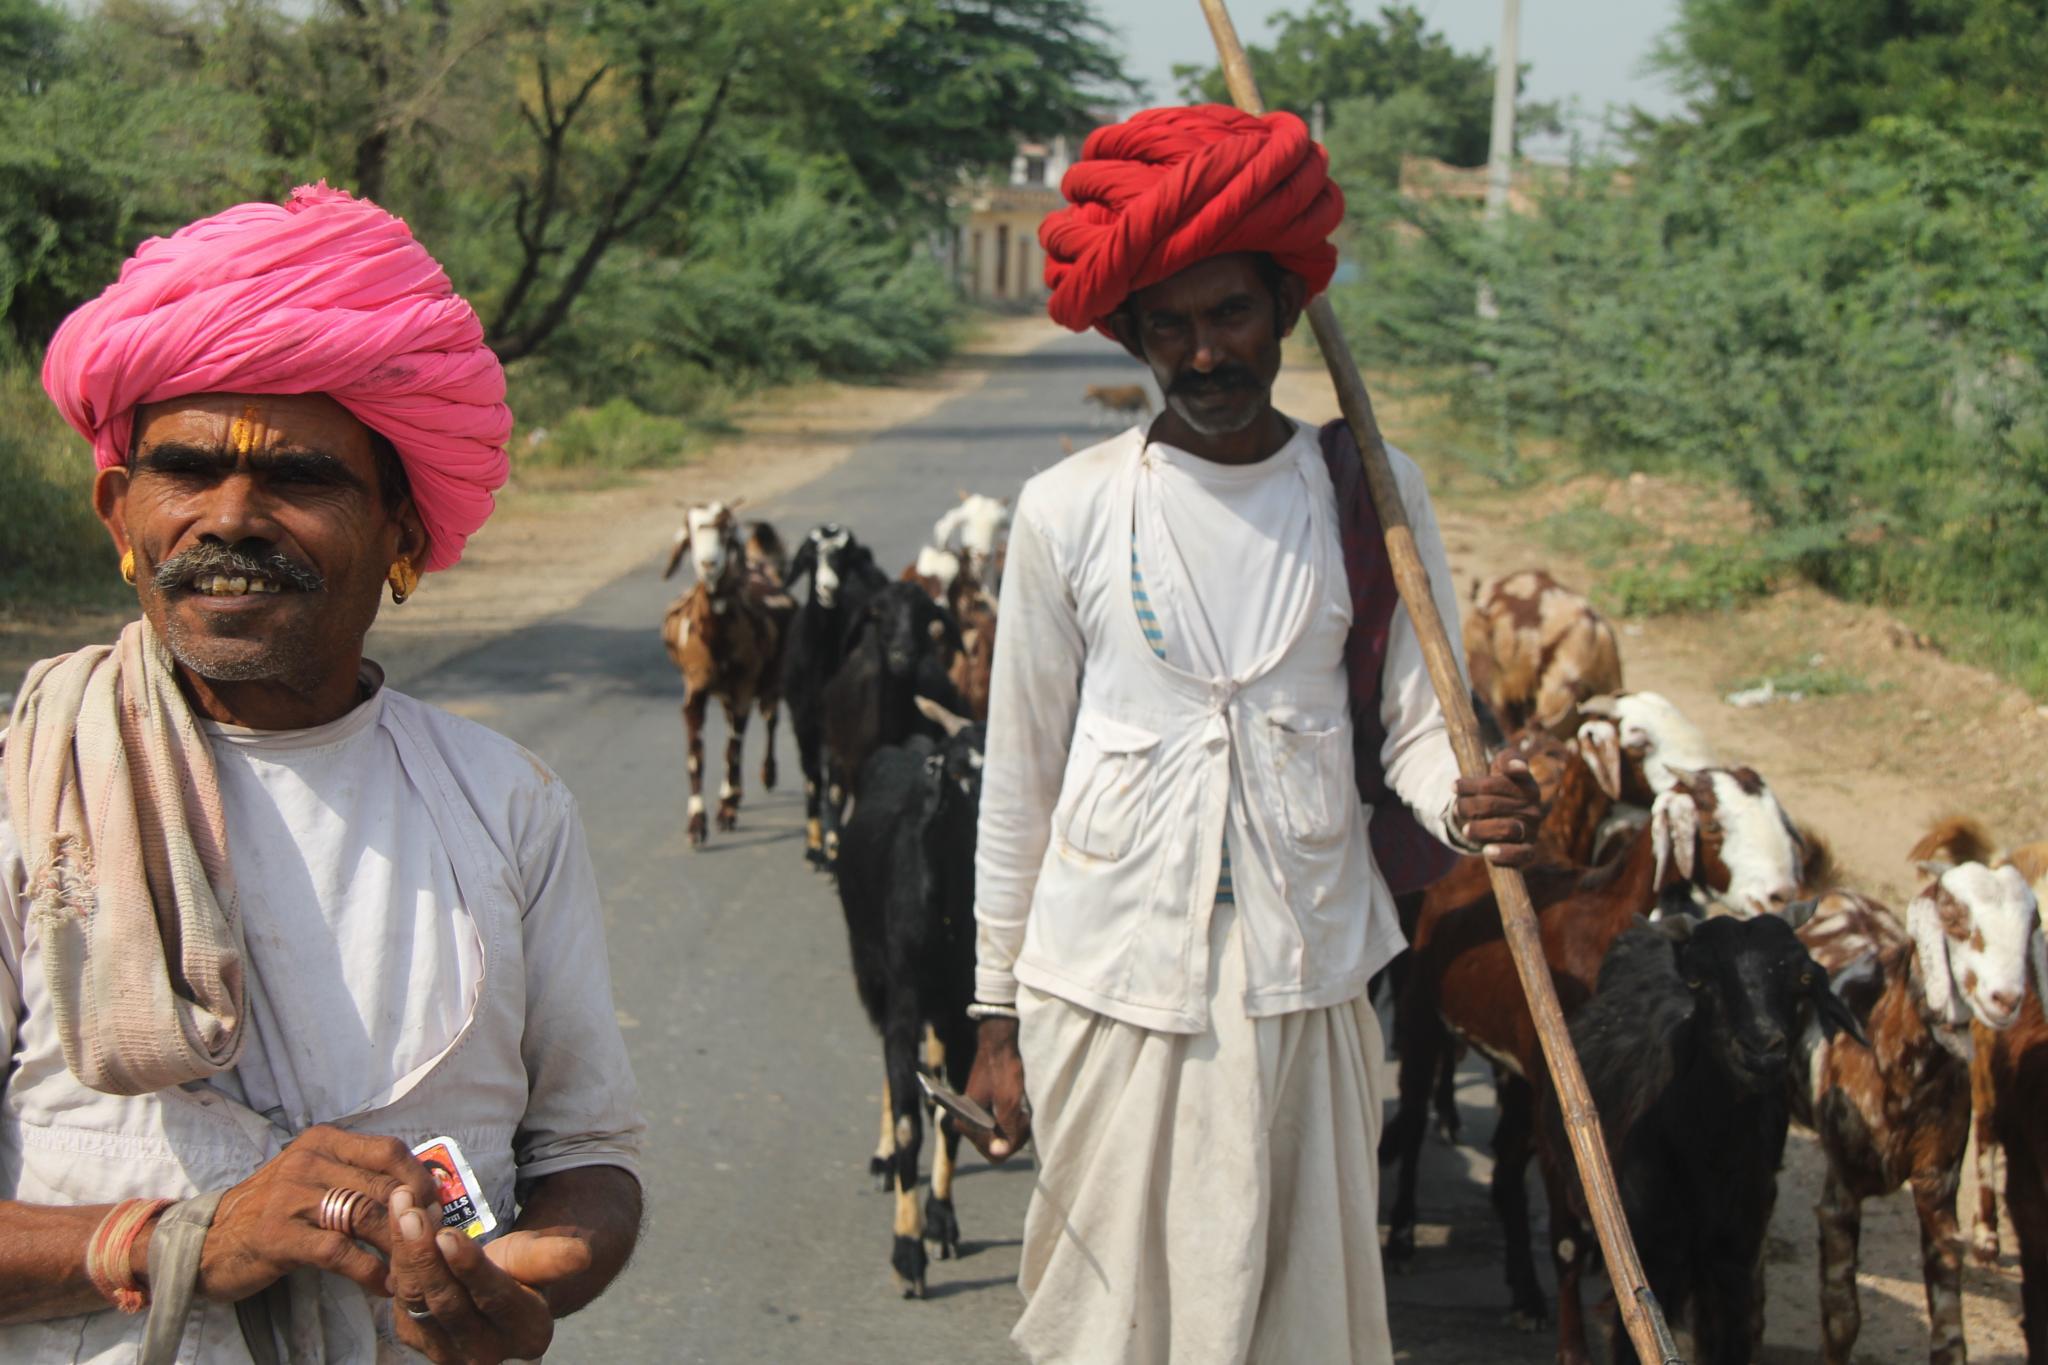 Shepherds of Rajasthan, India by jamilsayed